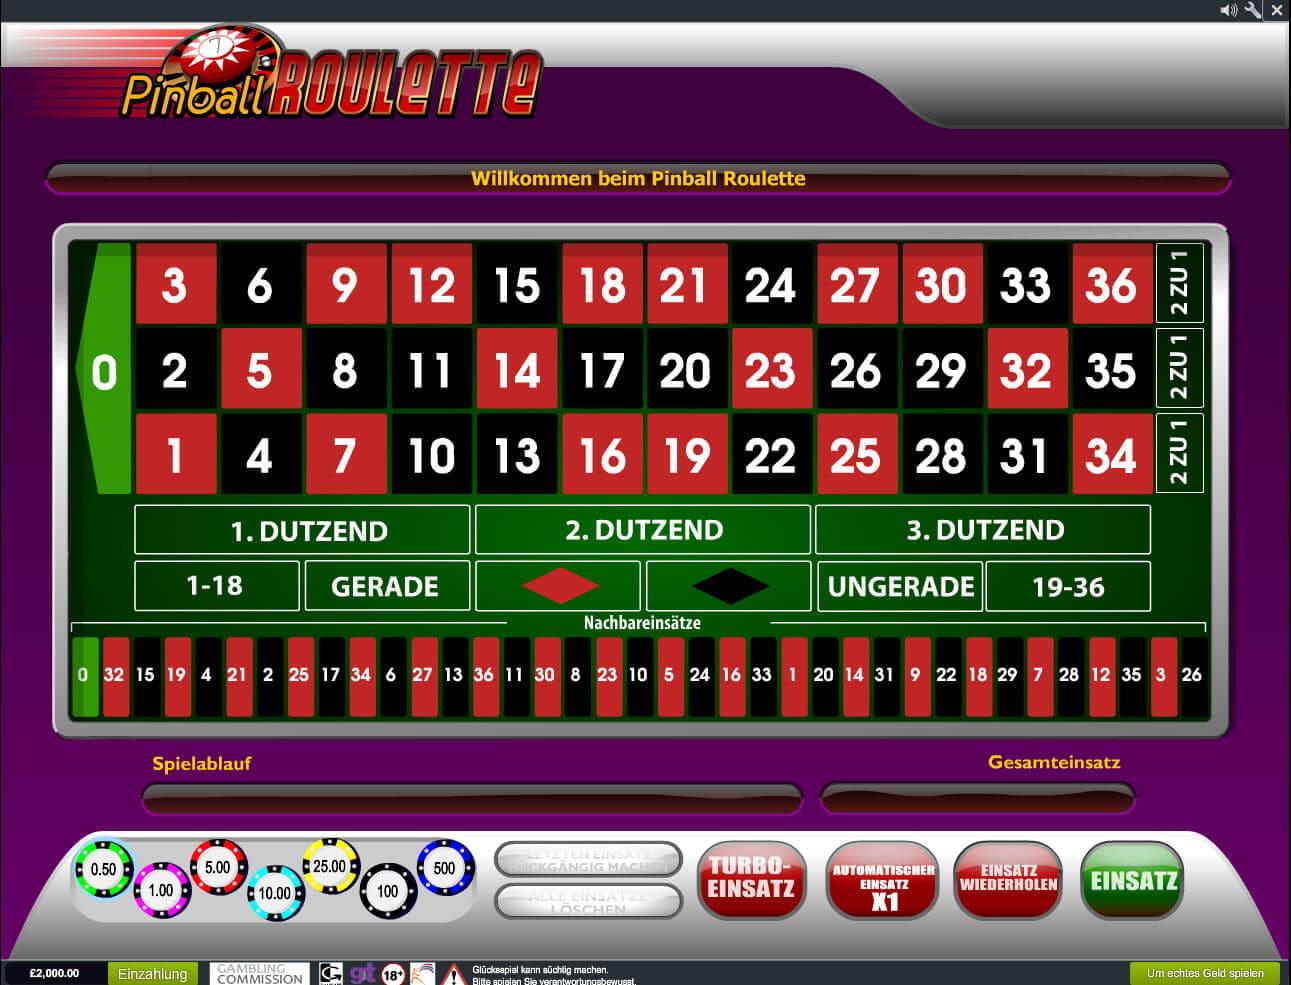 10 euro casino ohne einzahlung